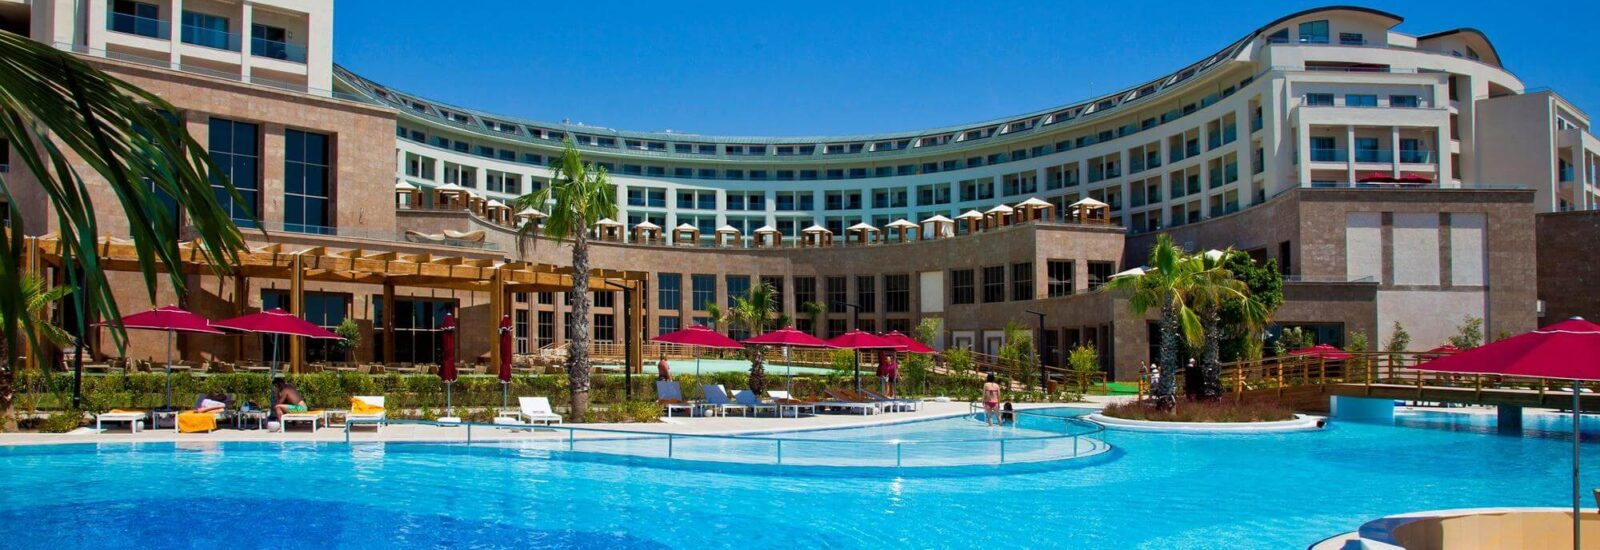 Kaya Palazzo Main Pool